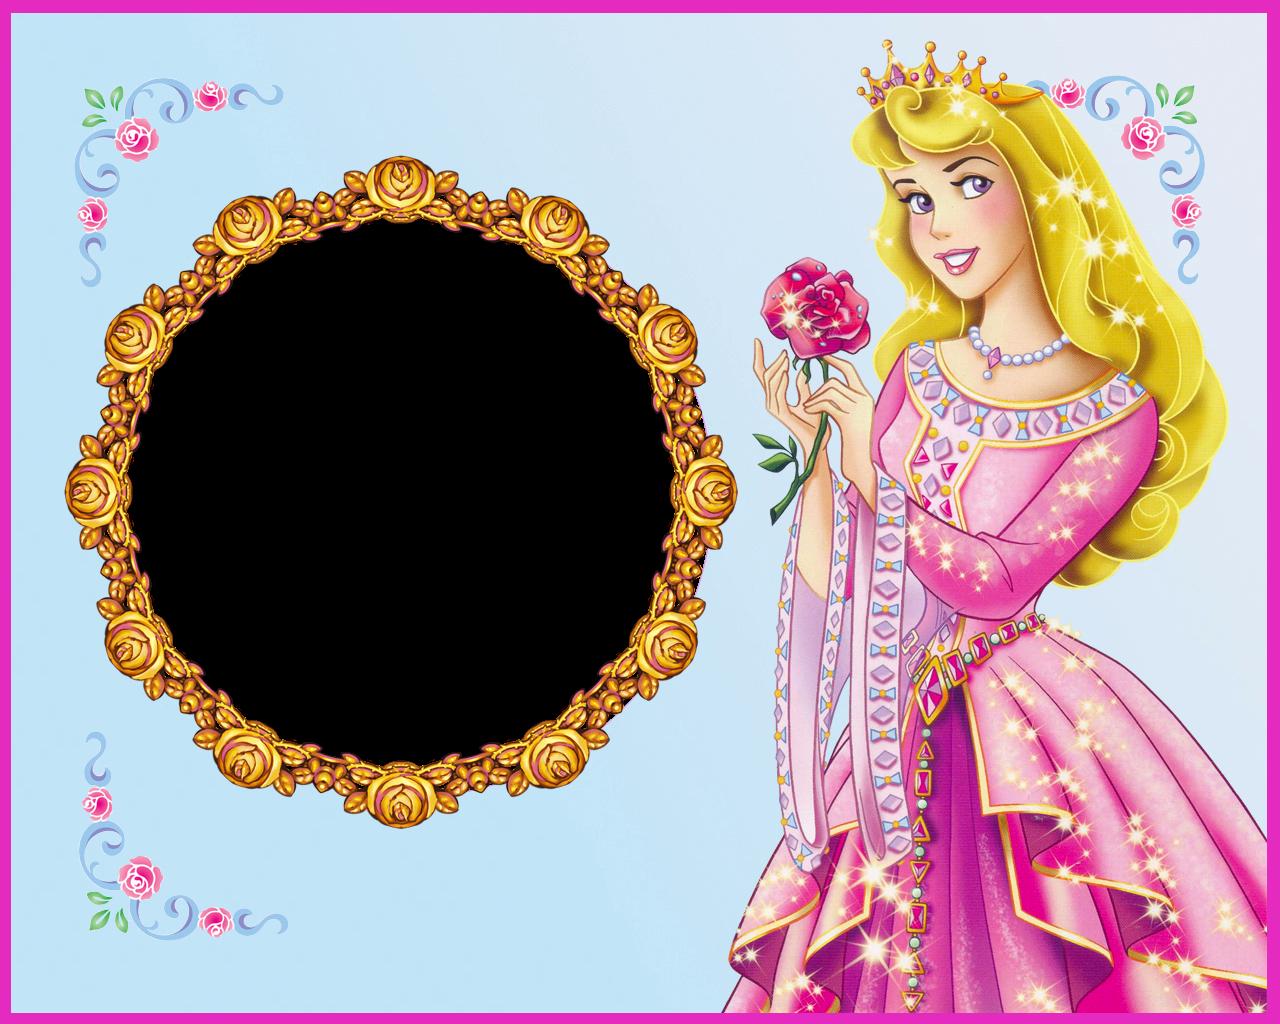 Fondos de princesas para fotomontajes | Fondos de Pantalla